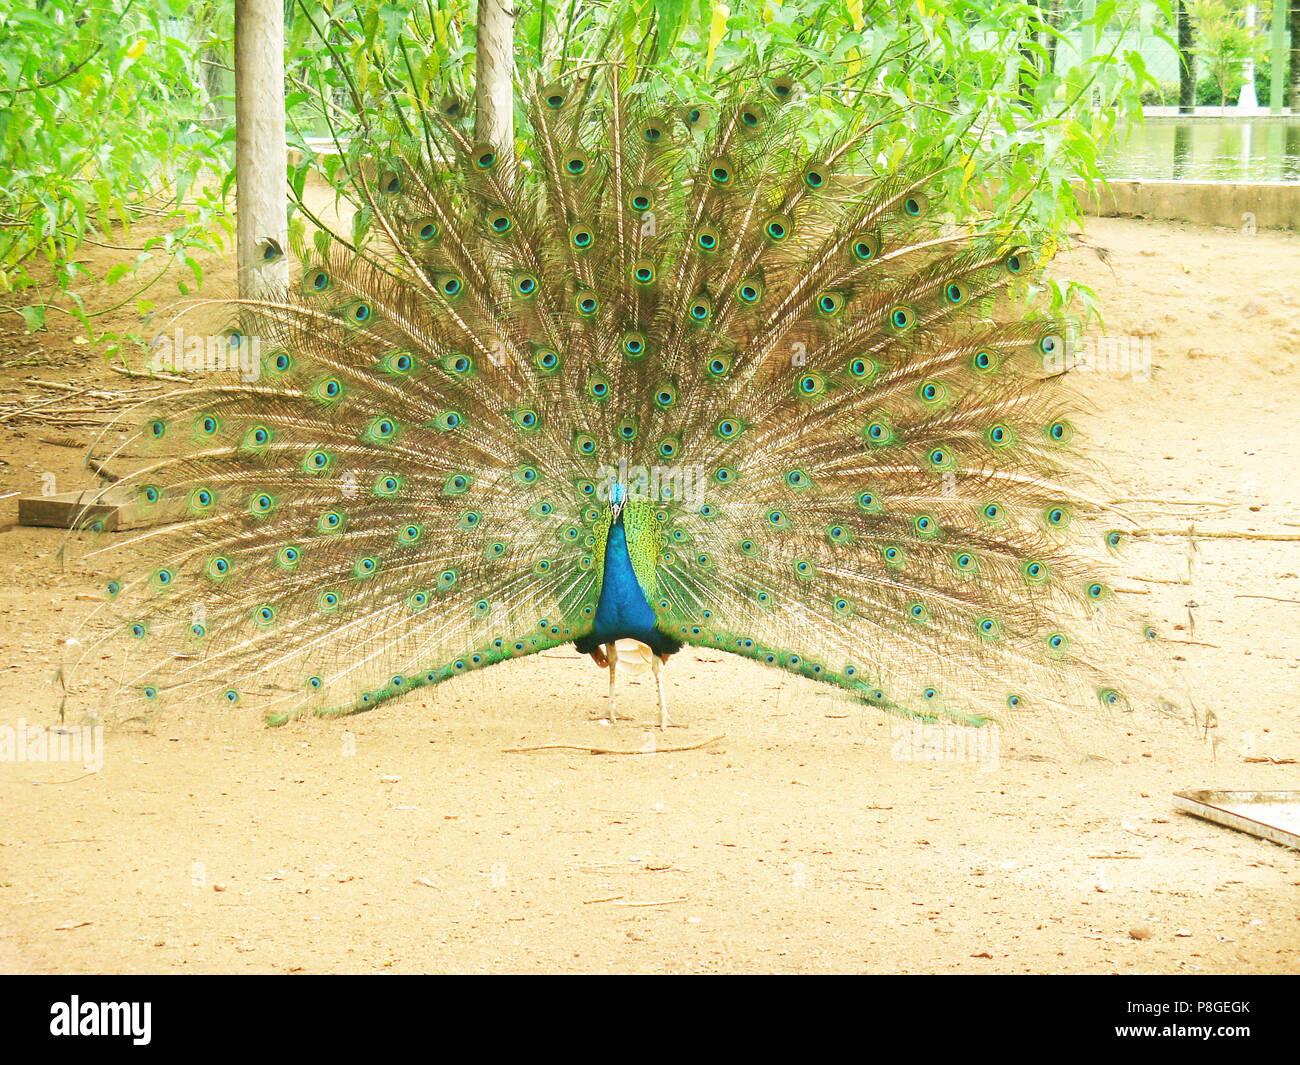 Bird, peacock, nursery, Espírito Santo, Brazil. - Stock Image